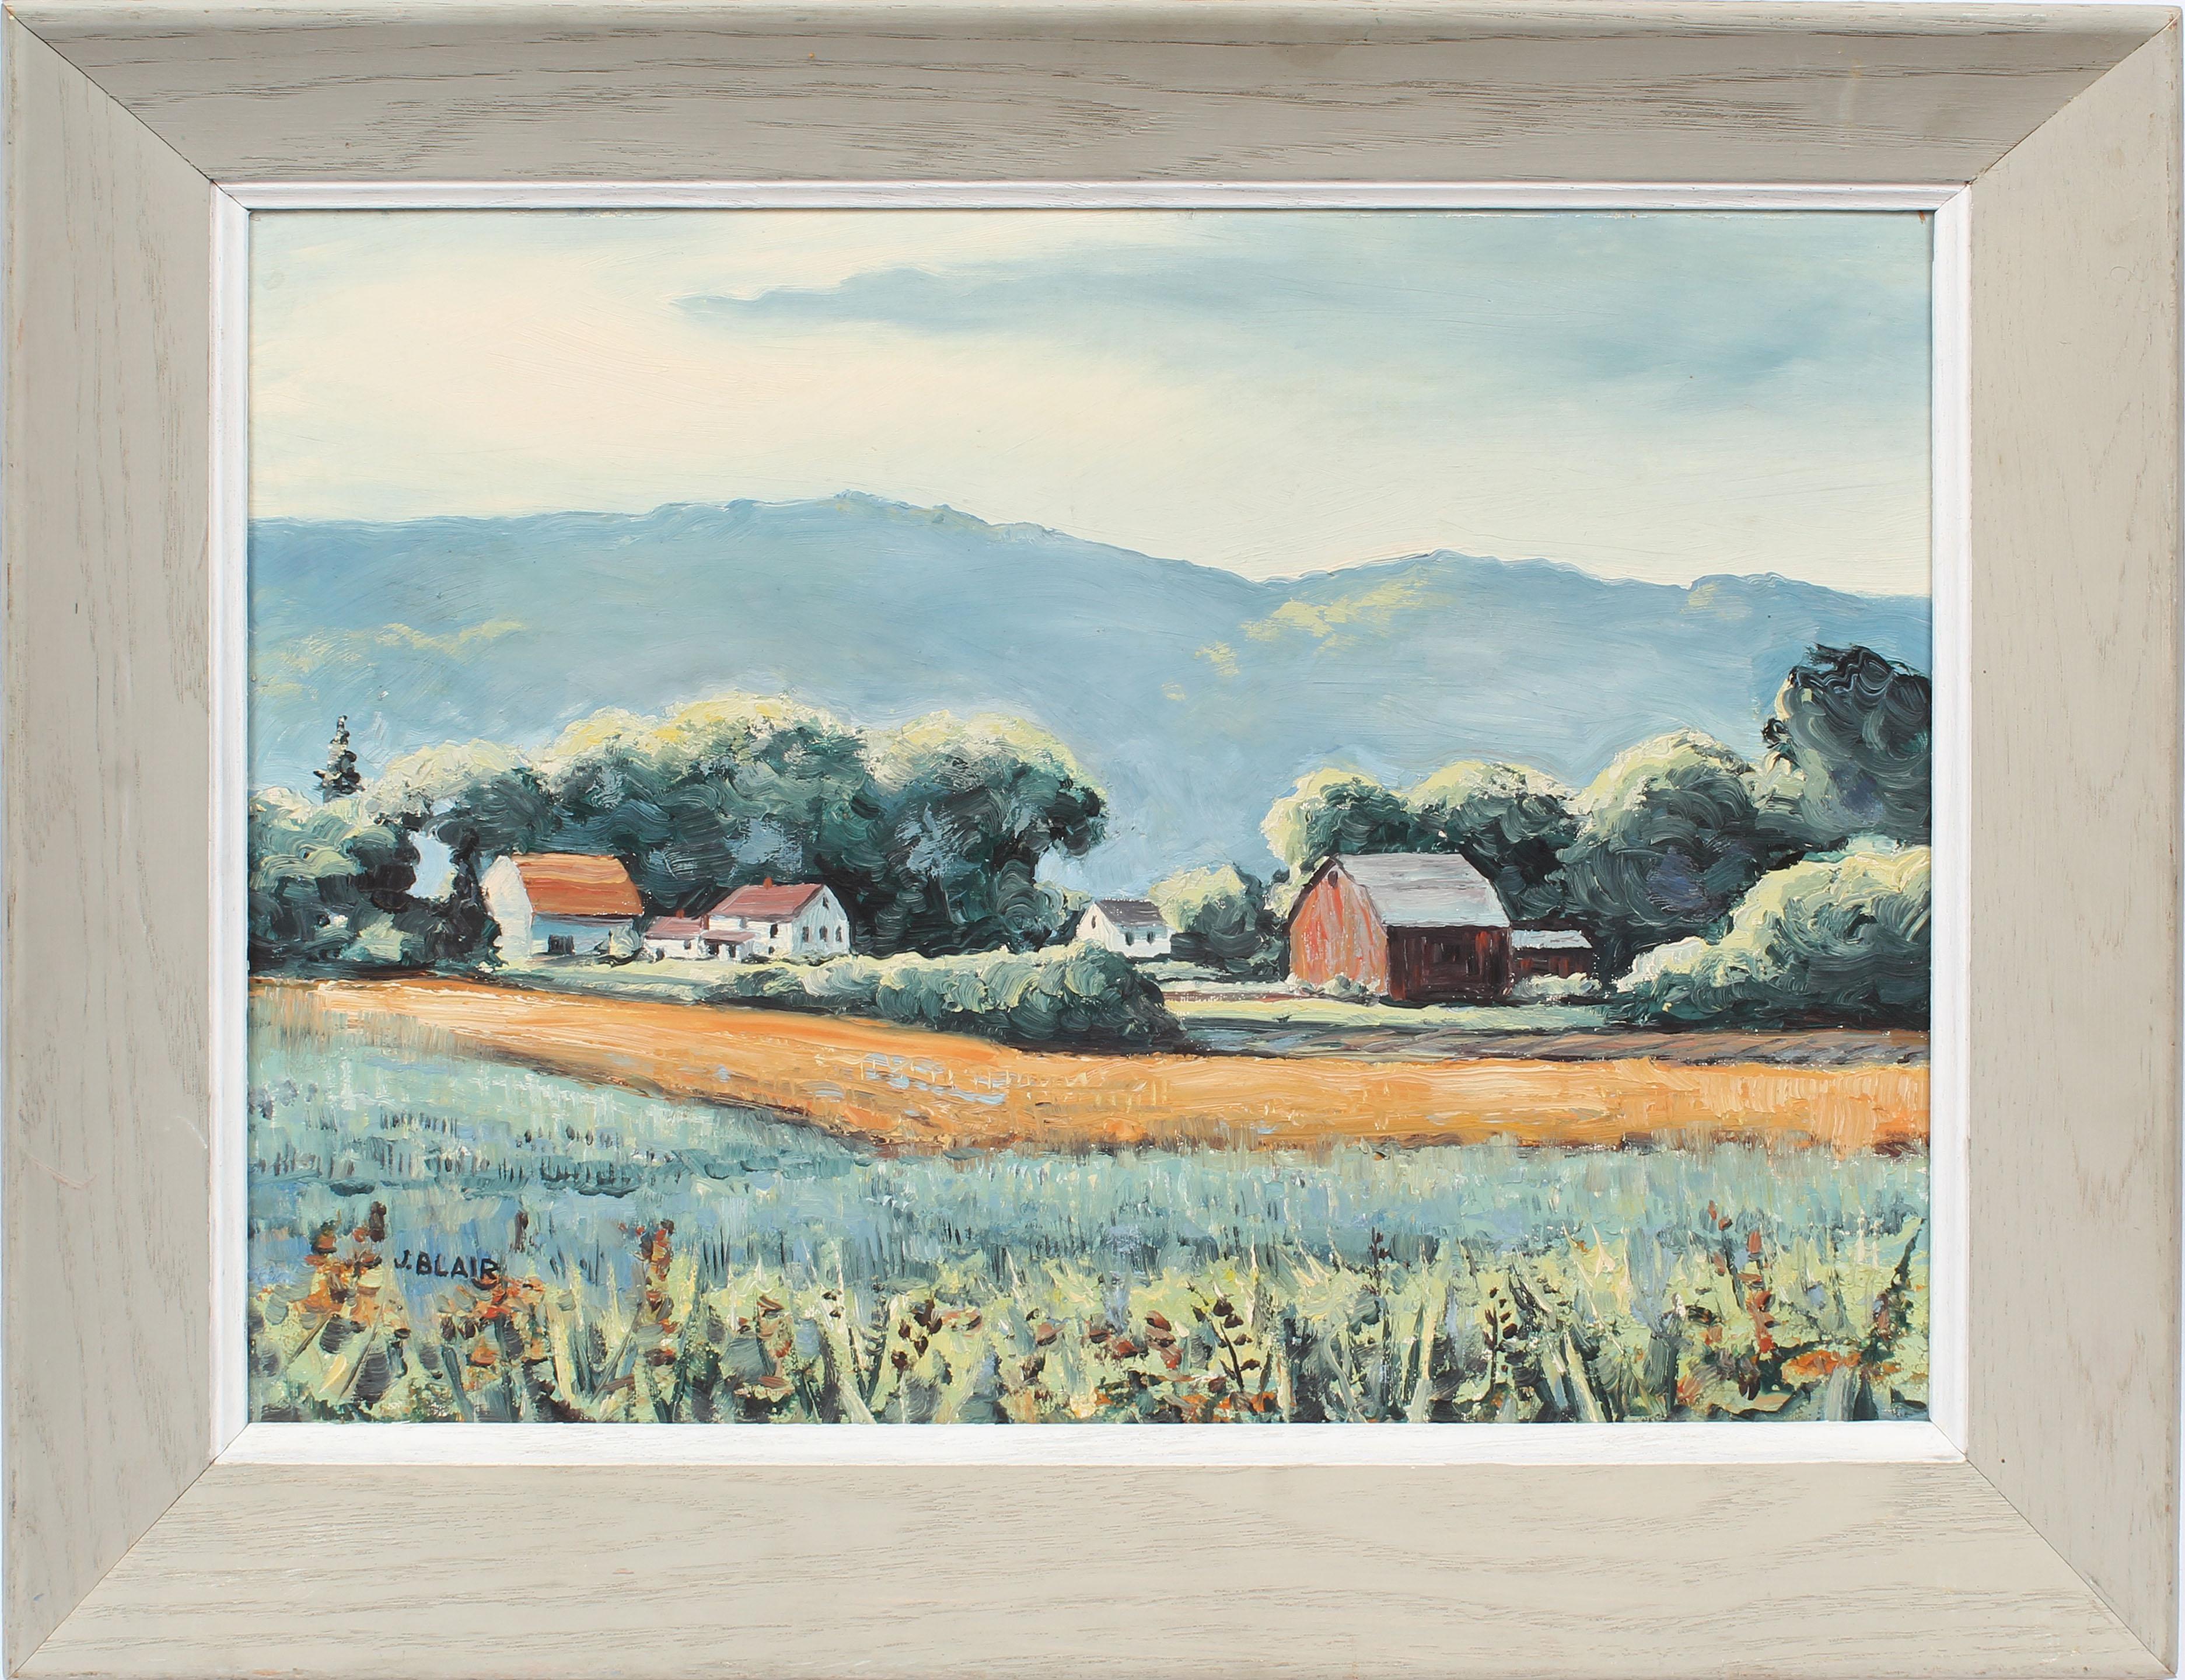 Antique American Female Impressionist New York Modernist Landscape Oil Painting